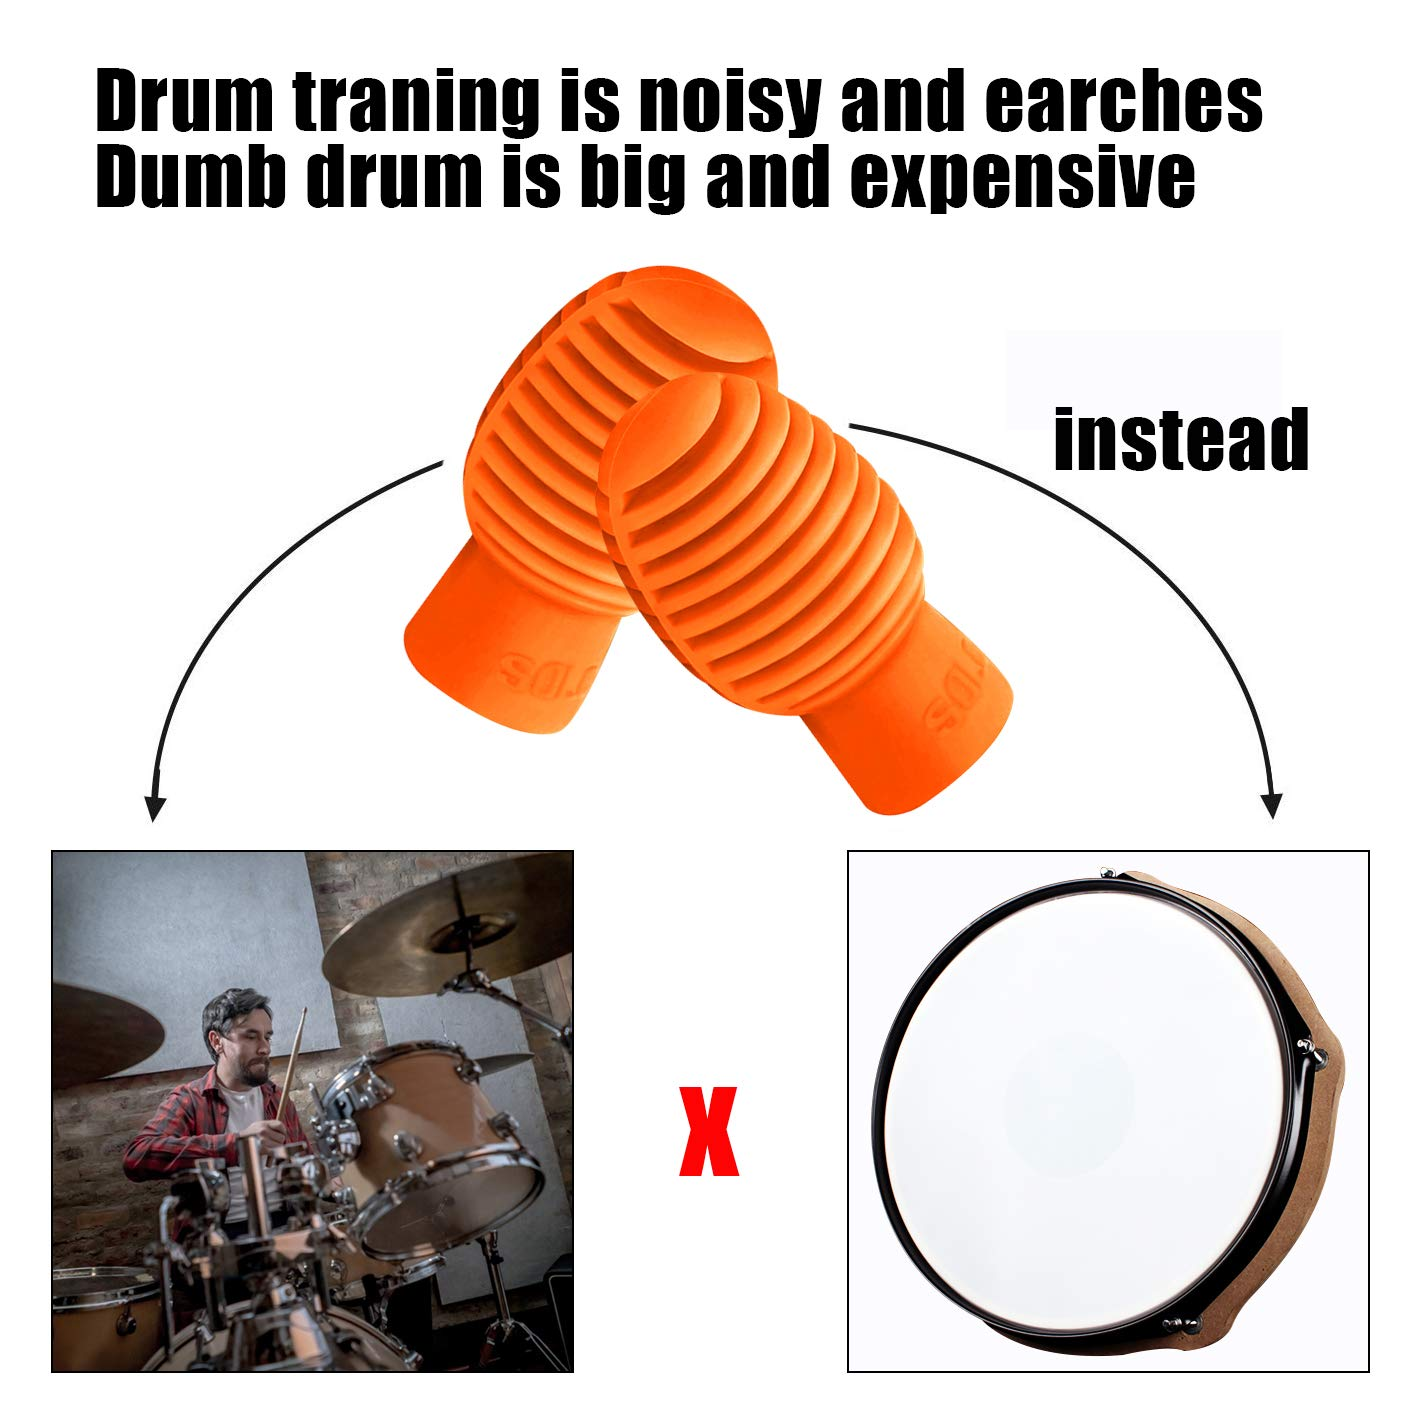 Fanxieast Practice Pad Mute Drum Sustituto Dampener Silicone Drumstick Silent Practice Tips Accesorio de percusi/ón Mute Reemplazo Instrumentos musicales Accesorio 4 PC, Gris